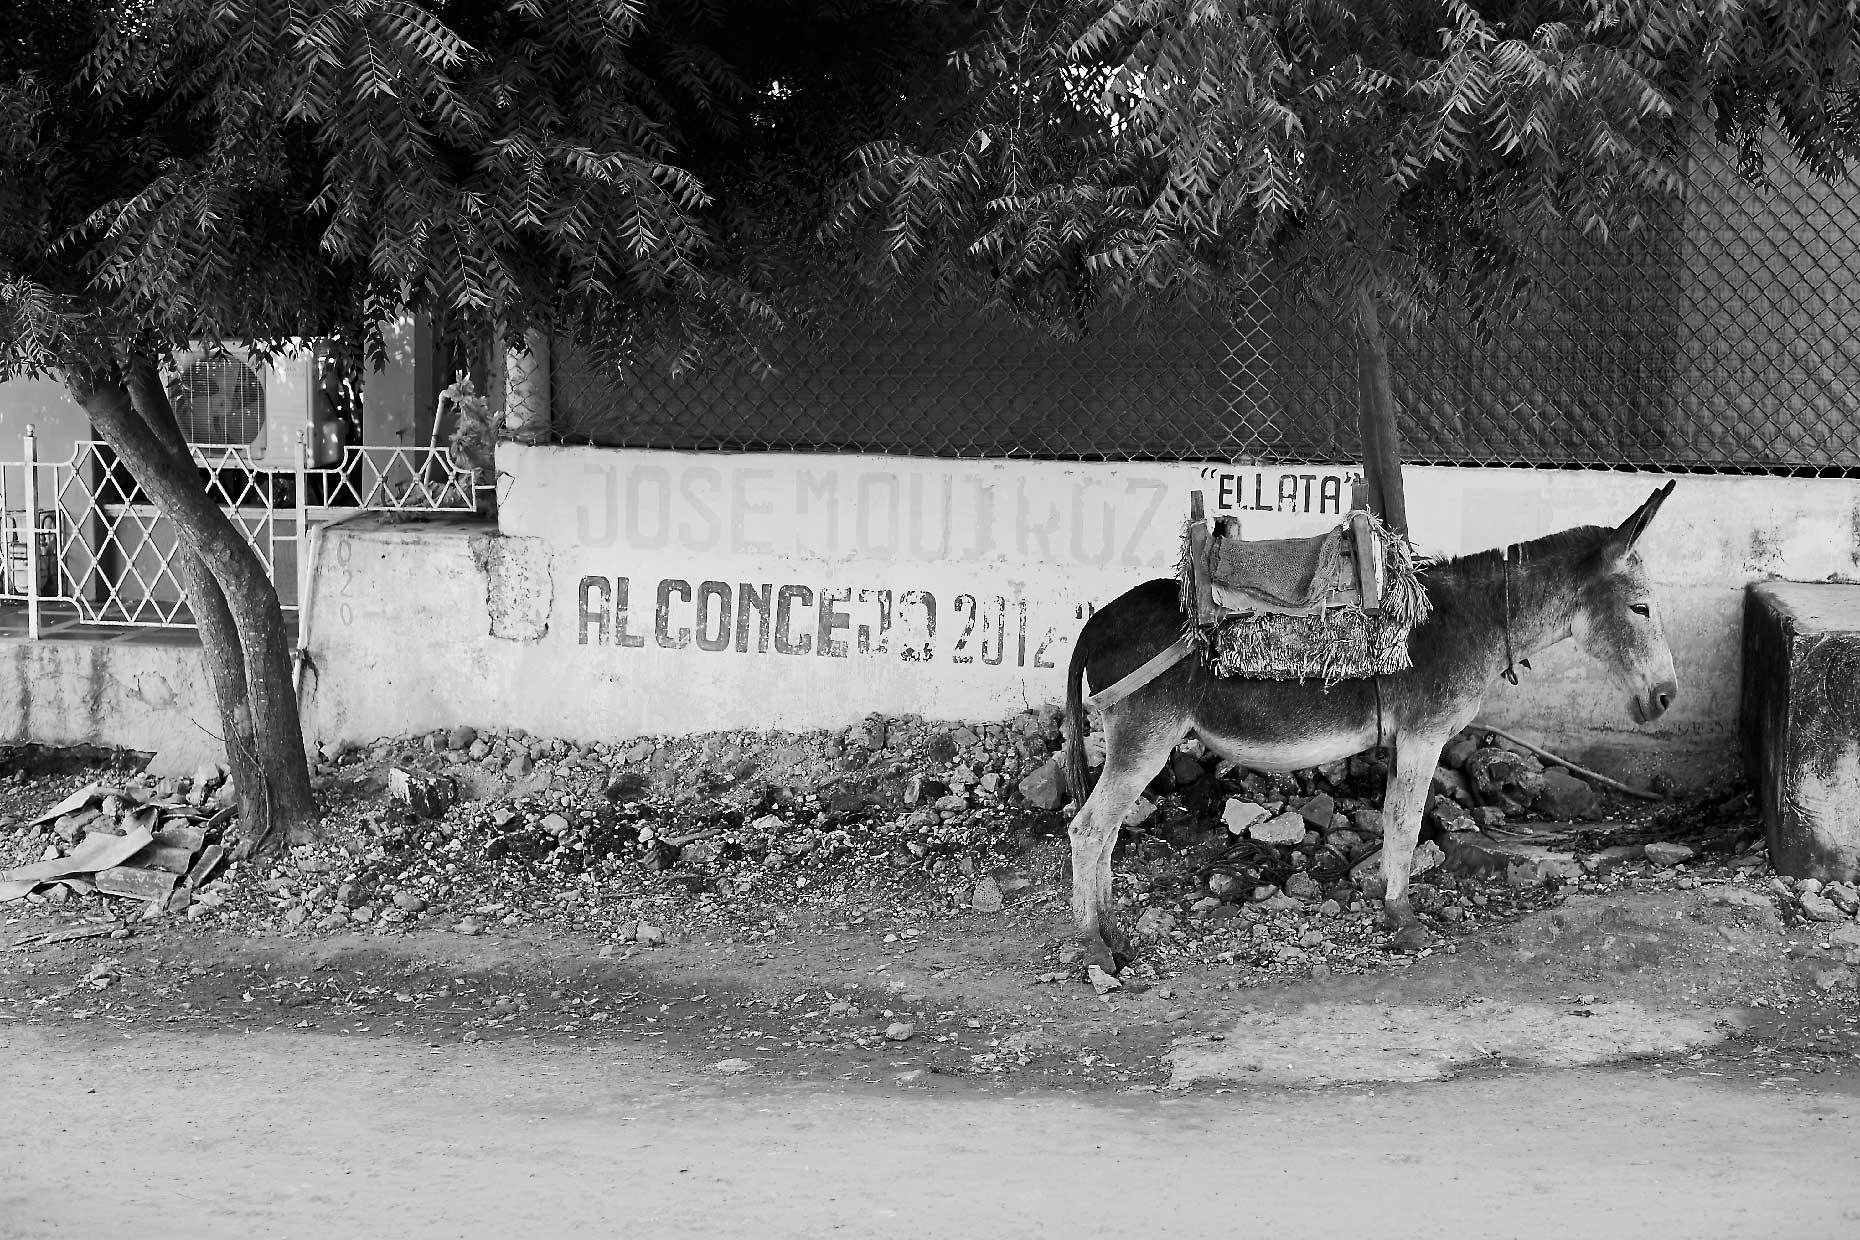 2016_0824_colombia_0300f_bw.jpg